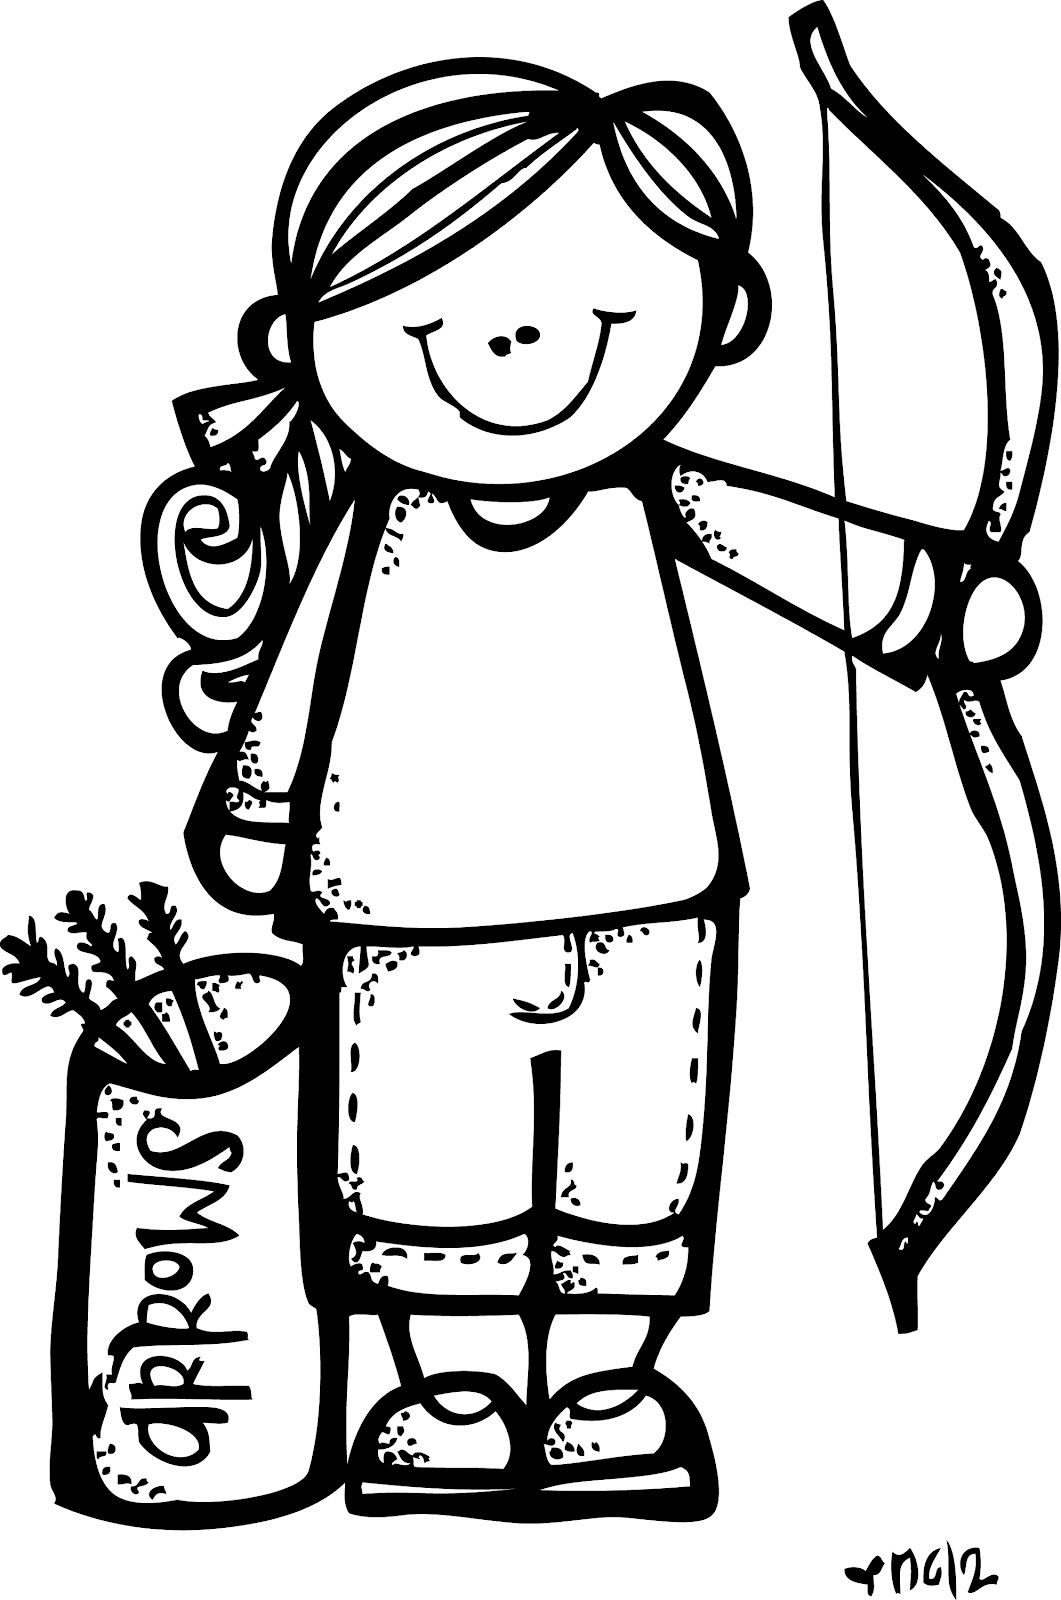 melonheadz lds illustrating girls camp illustrations clipart para rh pinterest ca girl guide camp clipart girl guide camp clipart